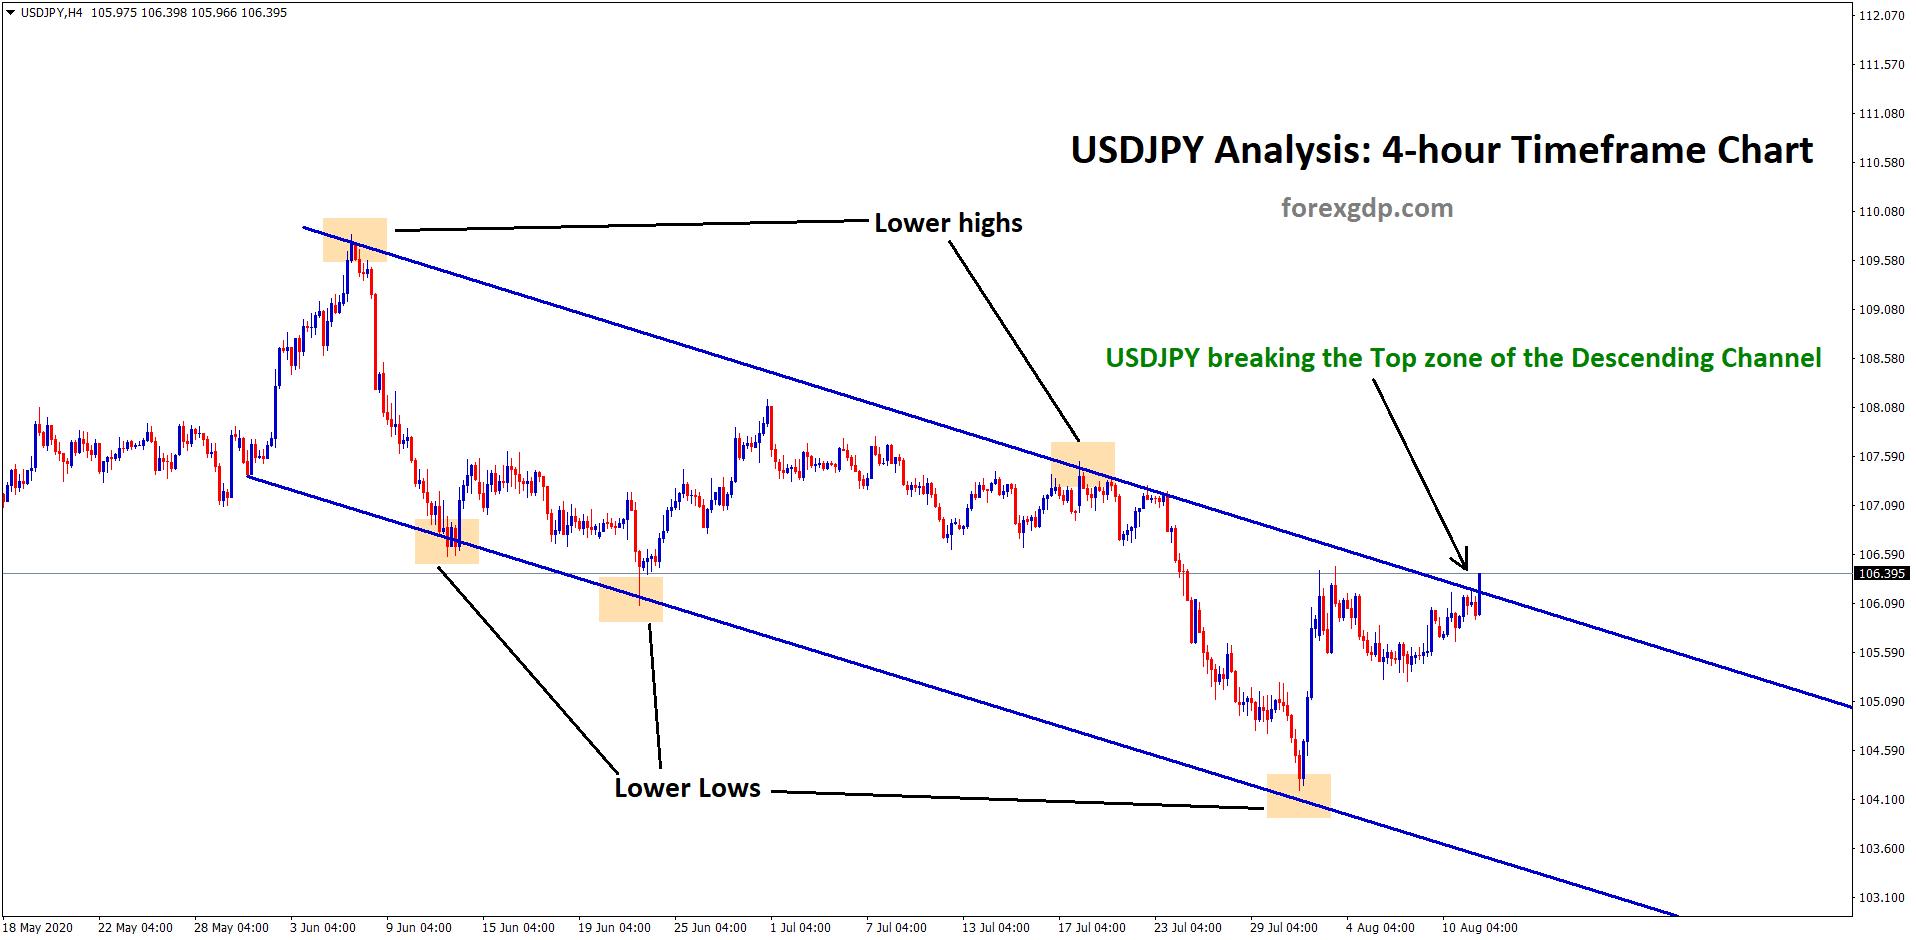 usdjpy breaking the top zone of the descending channel in h4